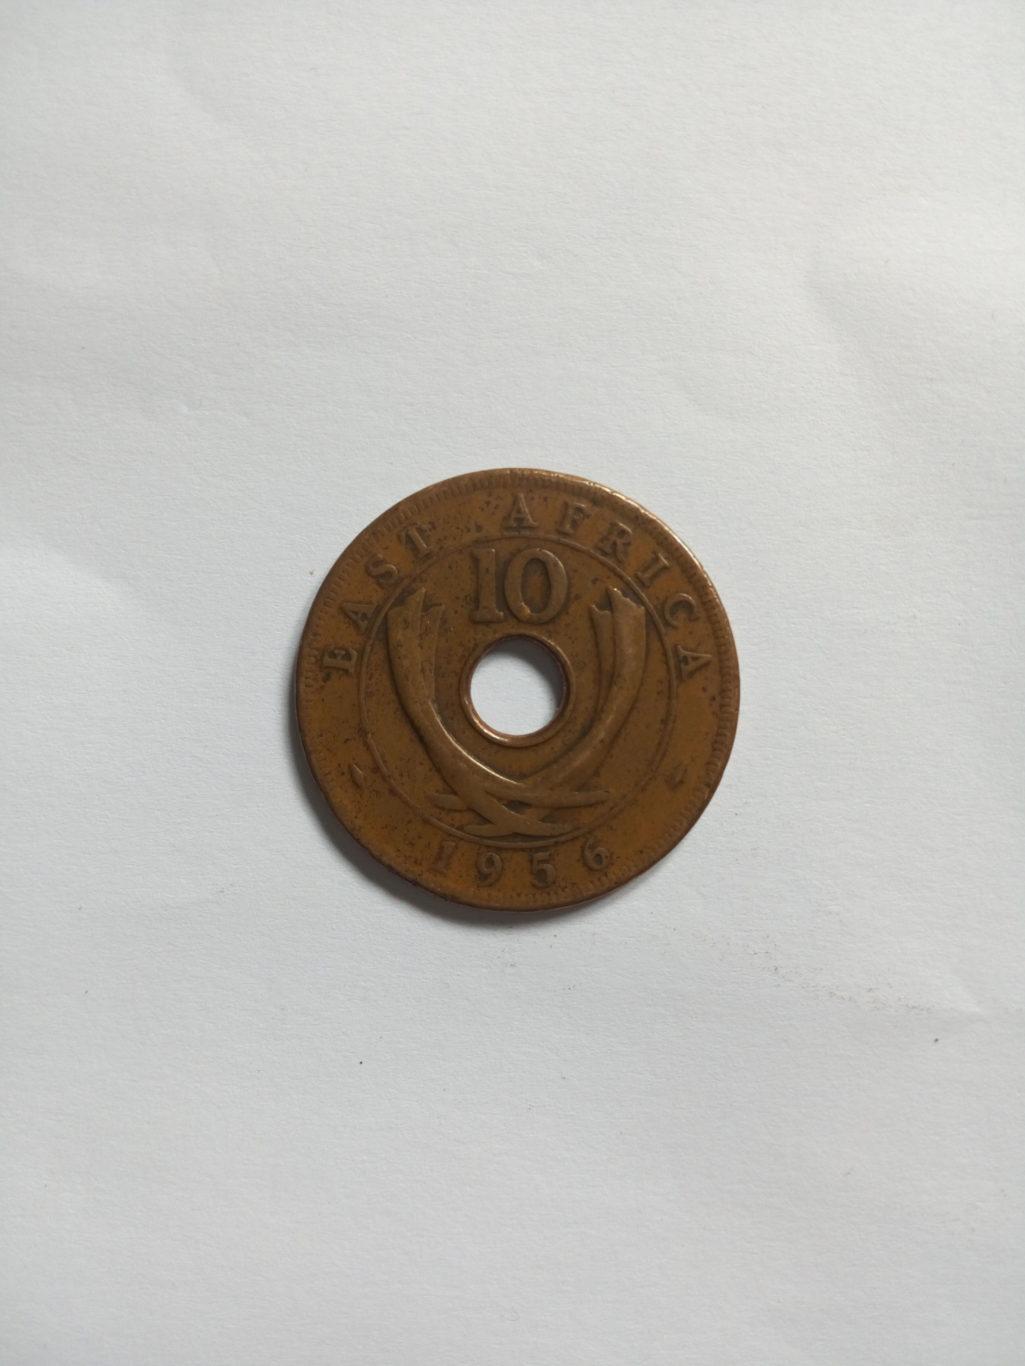 1956_Queen Elizabeth the second  10 cent